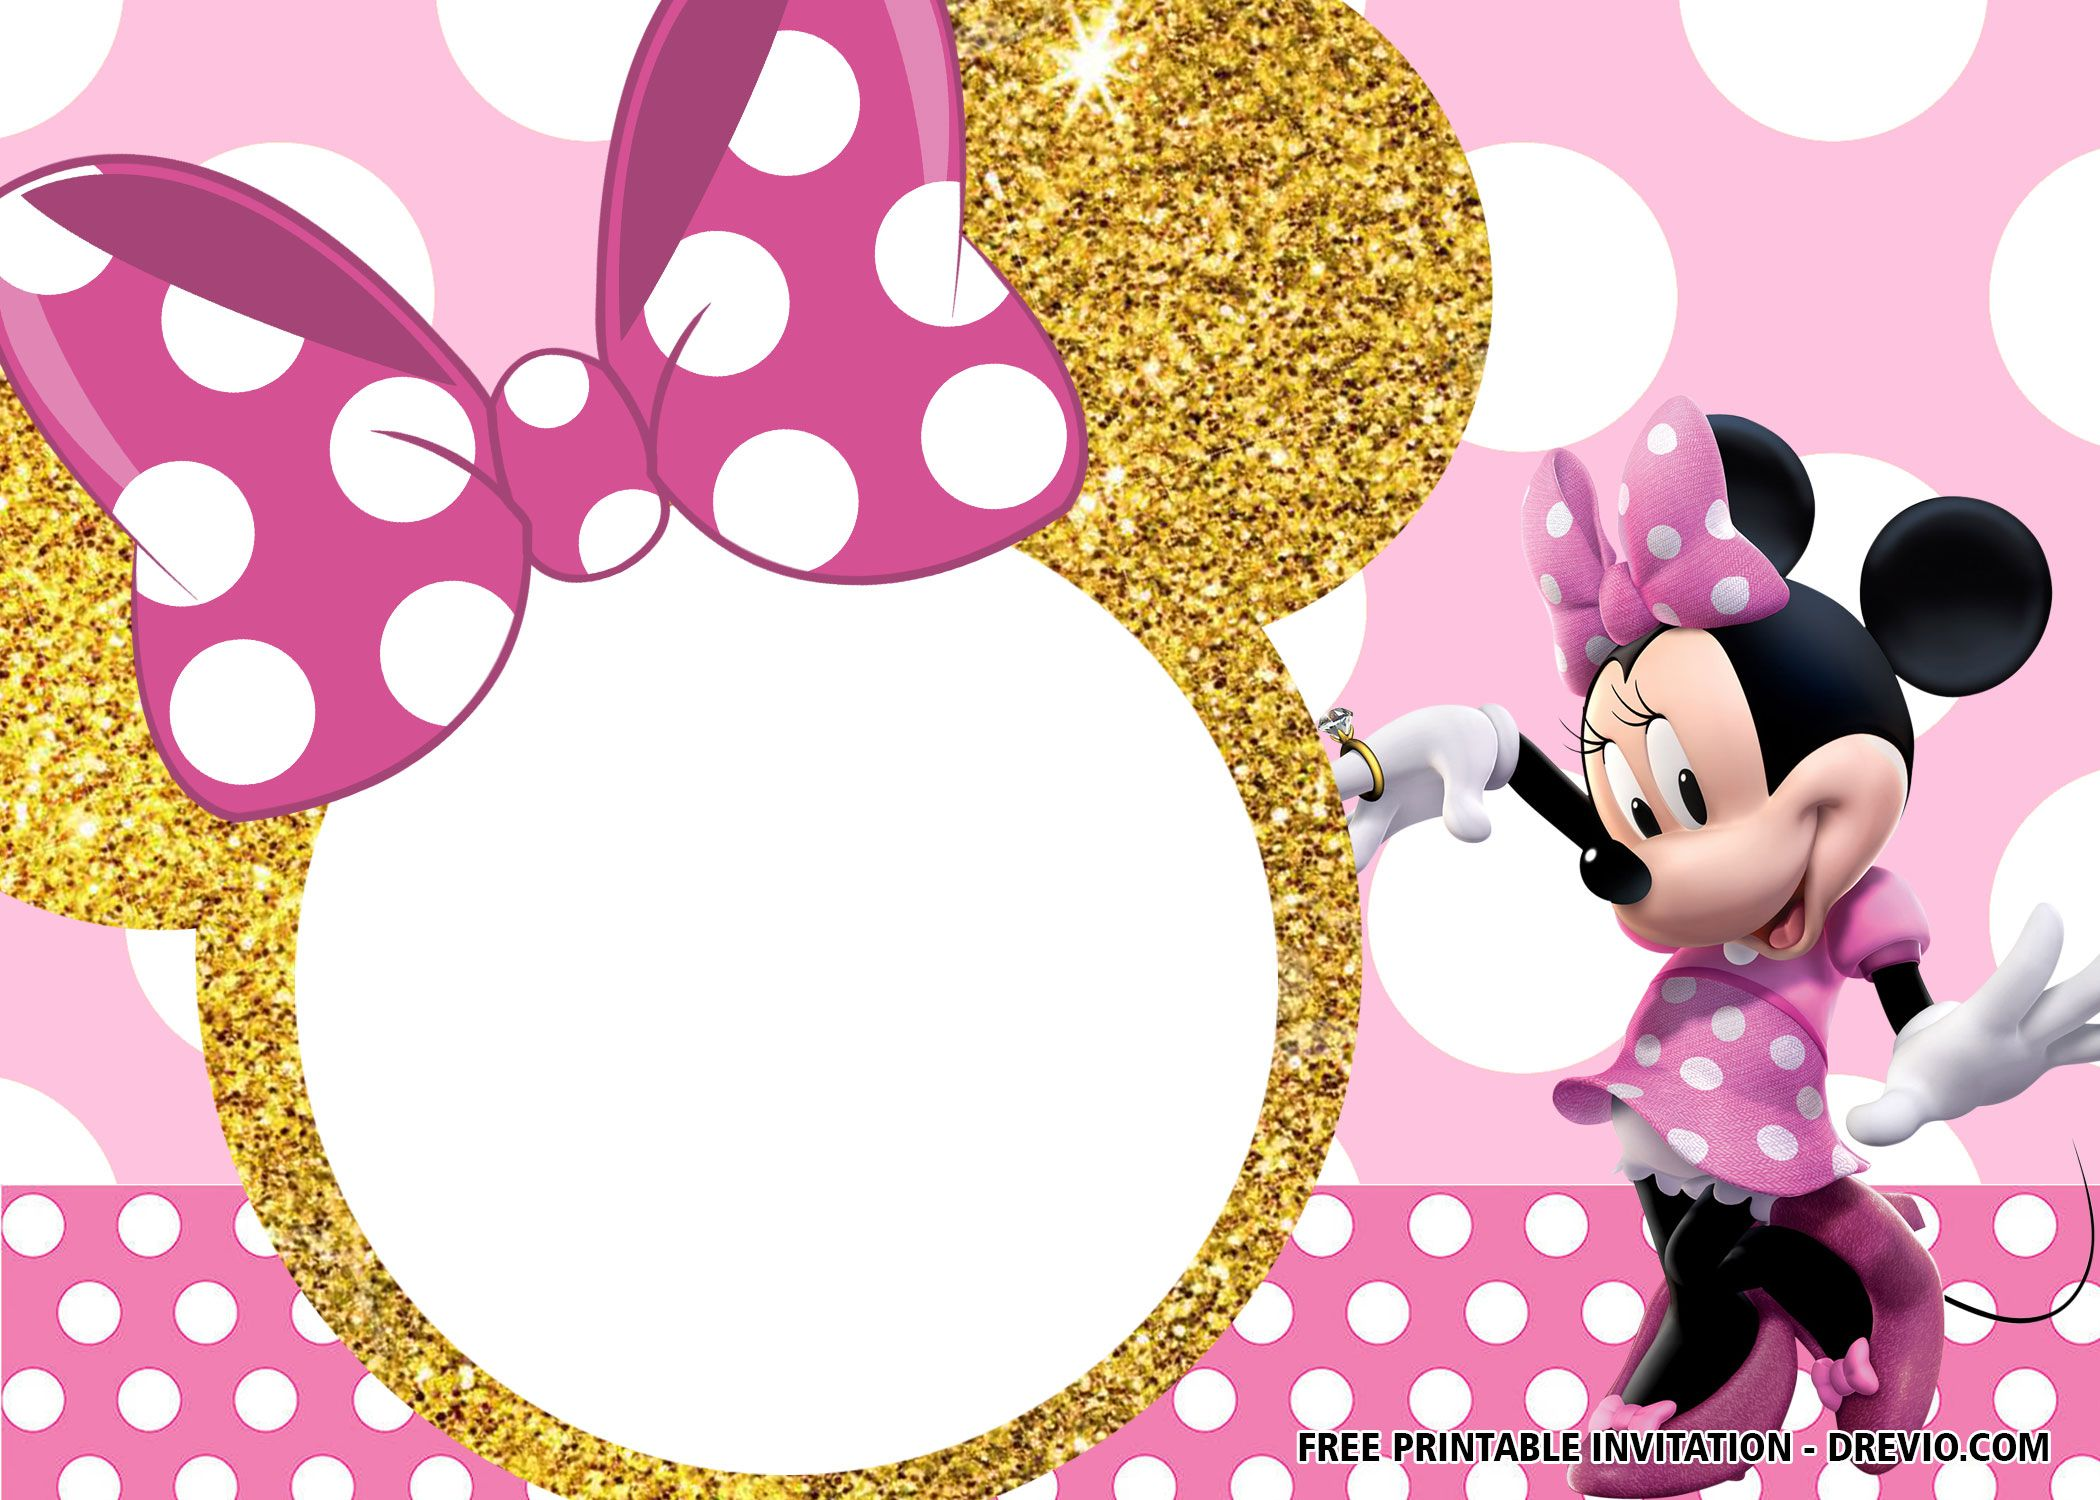 30 Free Printable Minnie Mouse Birthday Invitation Templates Minnie Mouse Birthday Invitations Minnie Mouse Invitations Minnie Mouse Birthday